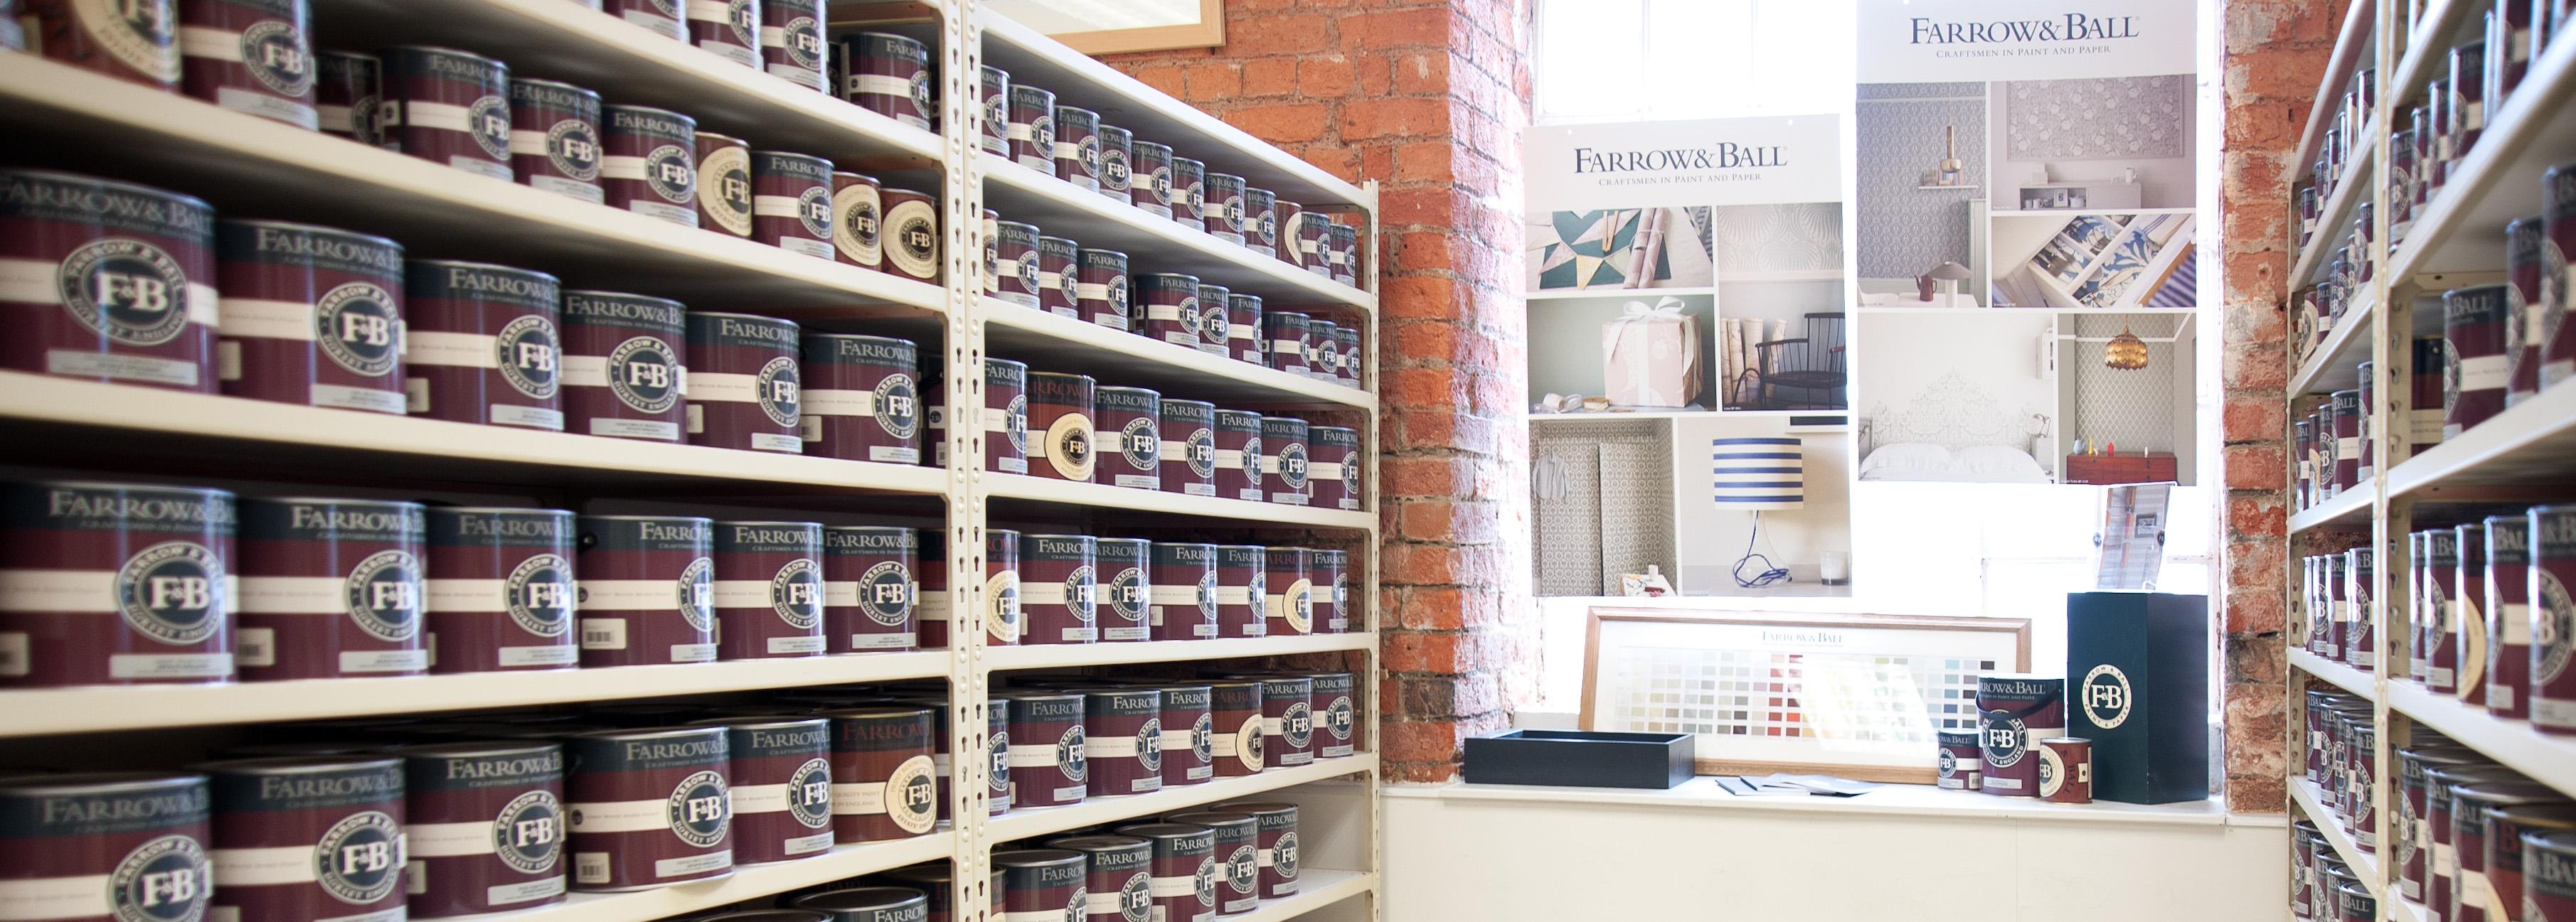 Farrow Ball Paint Suppliers Bailey Paints Ltd